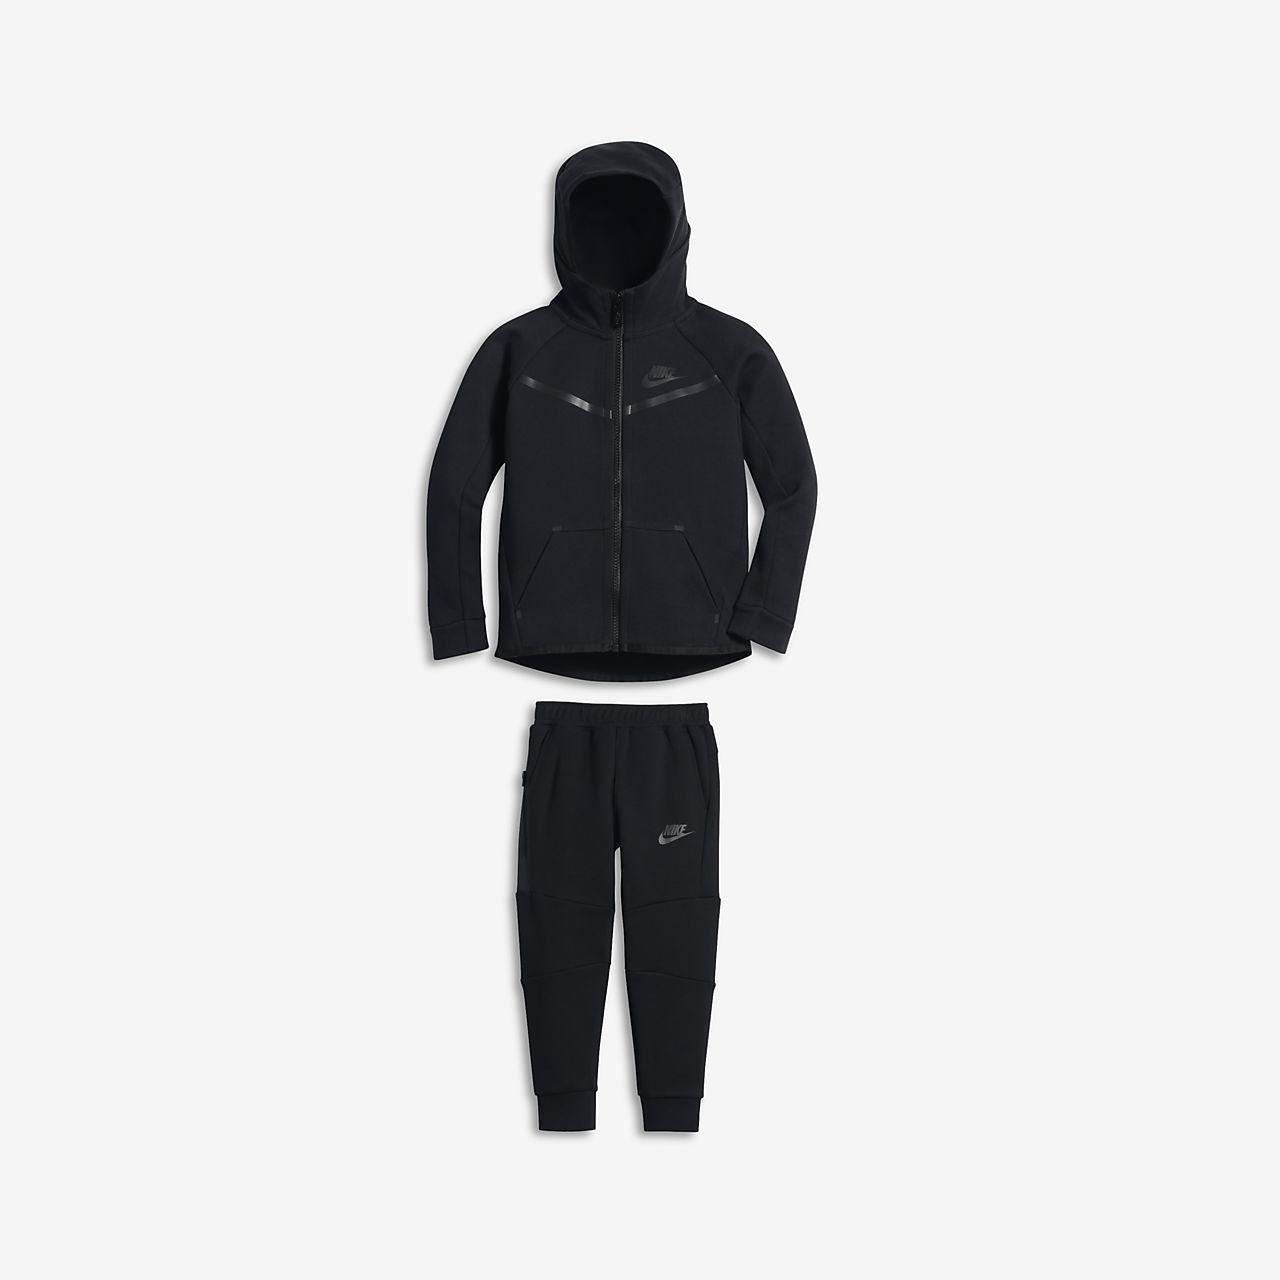 Nike Tech Fleece Conjunt de dues peces - Infant